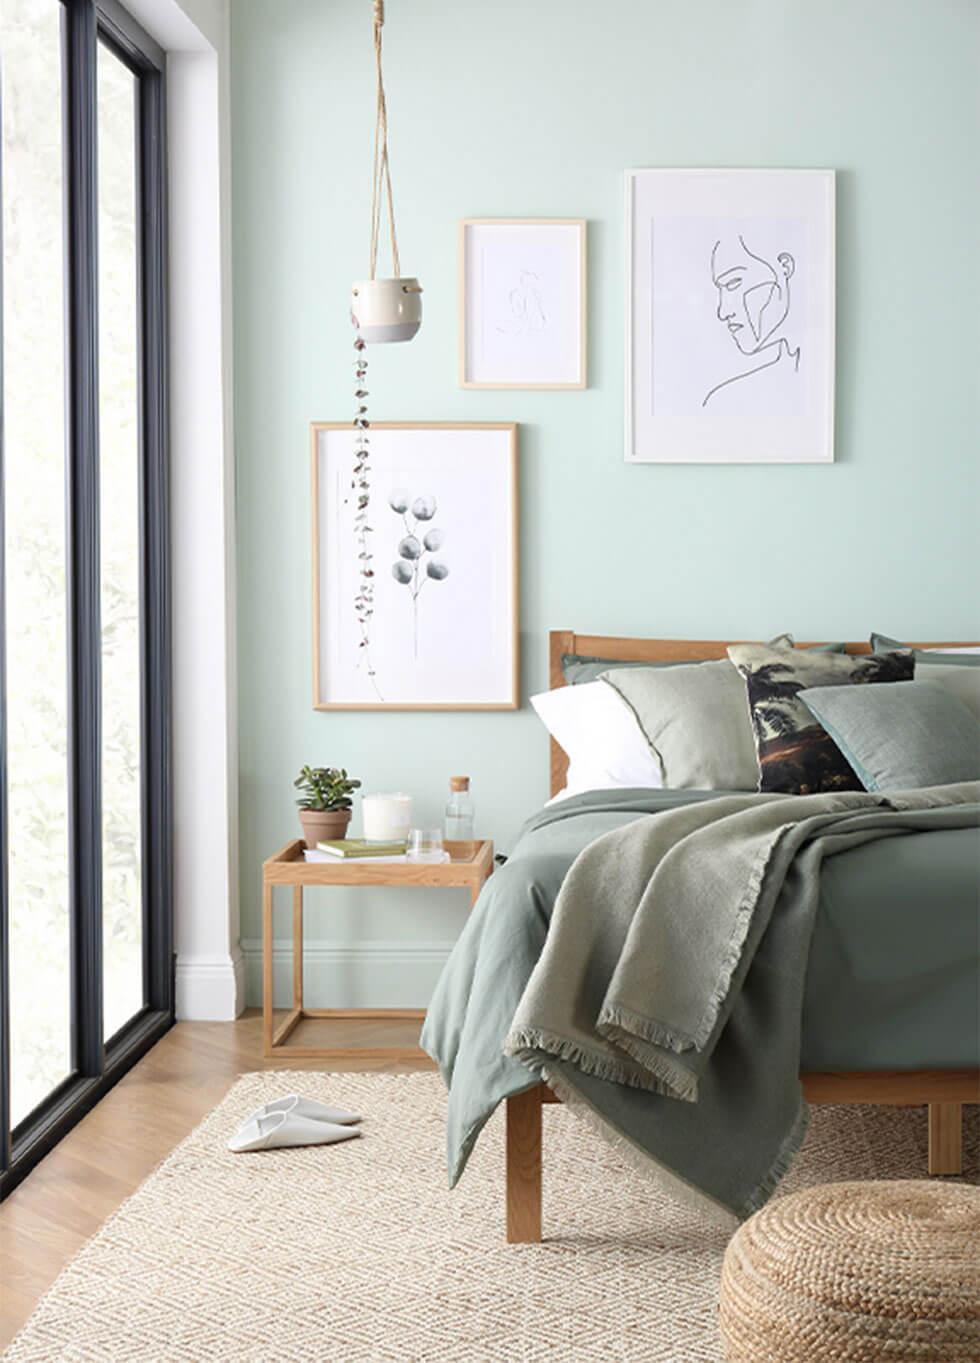 Sage green walls in a calm serene bedroom